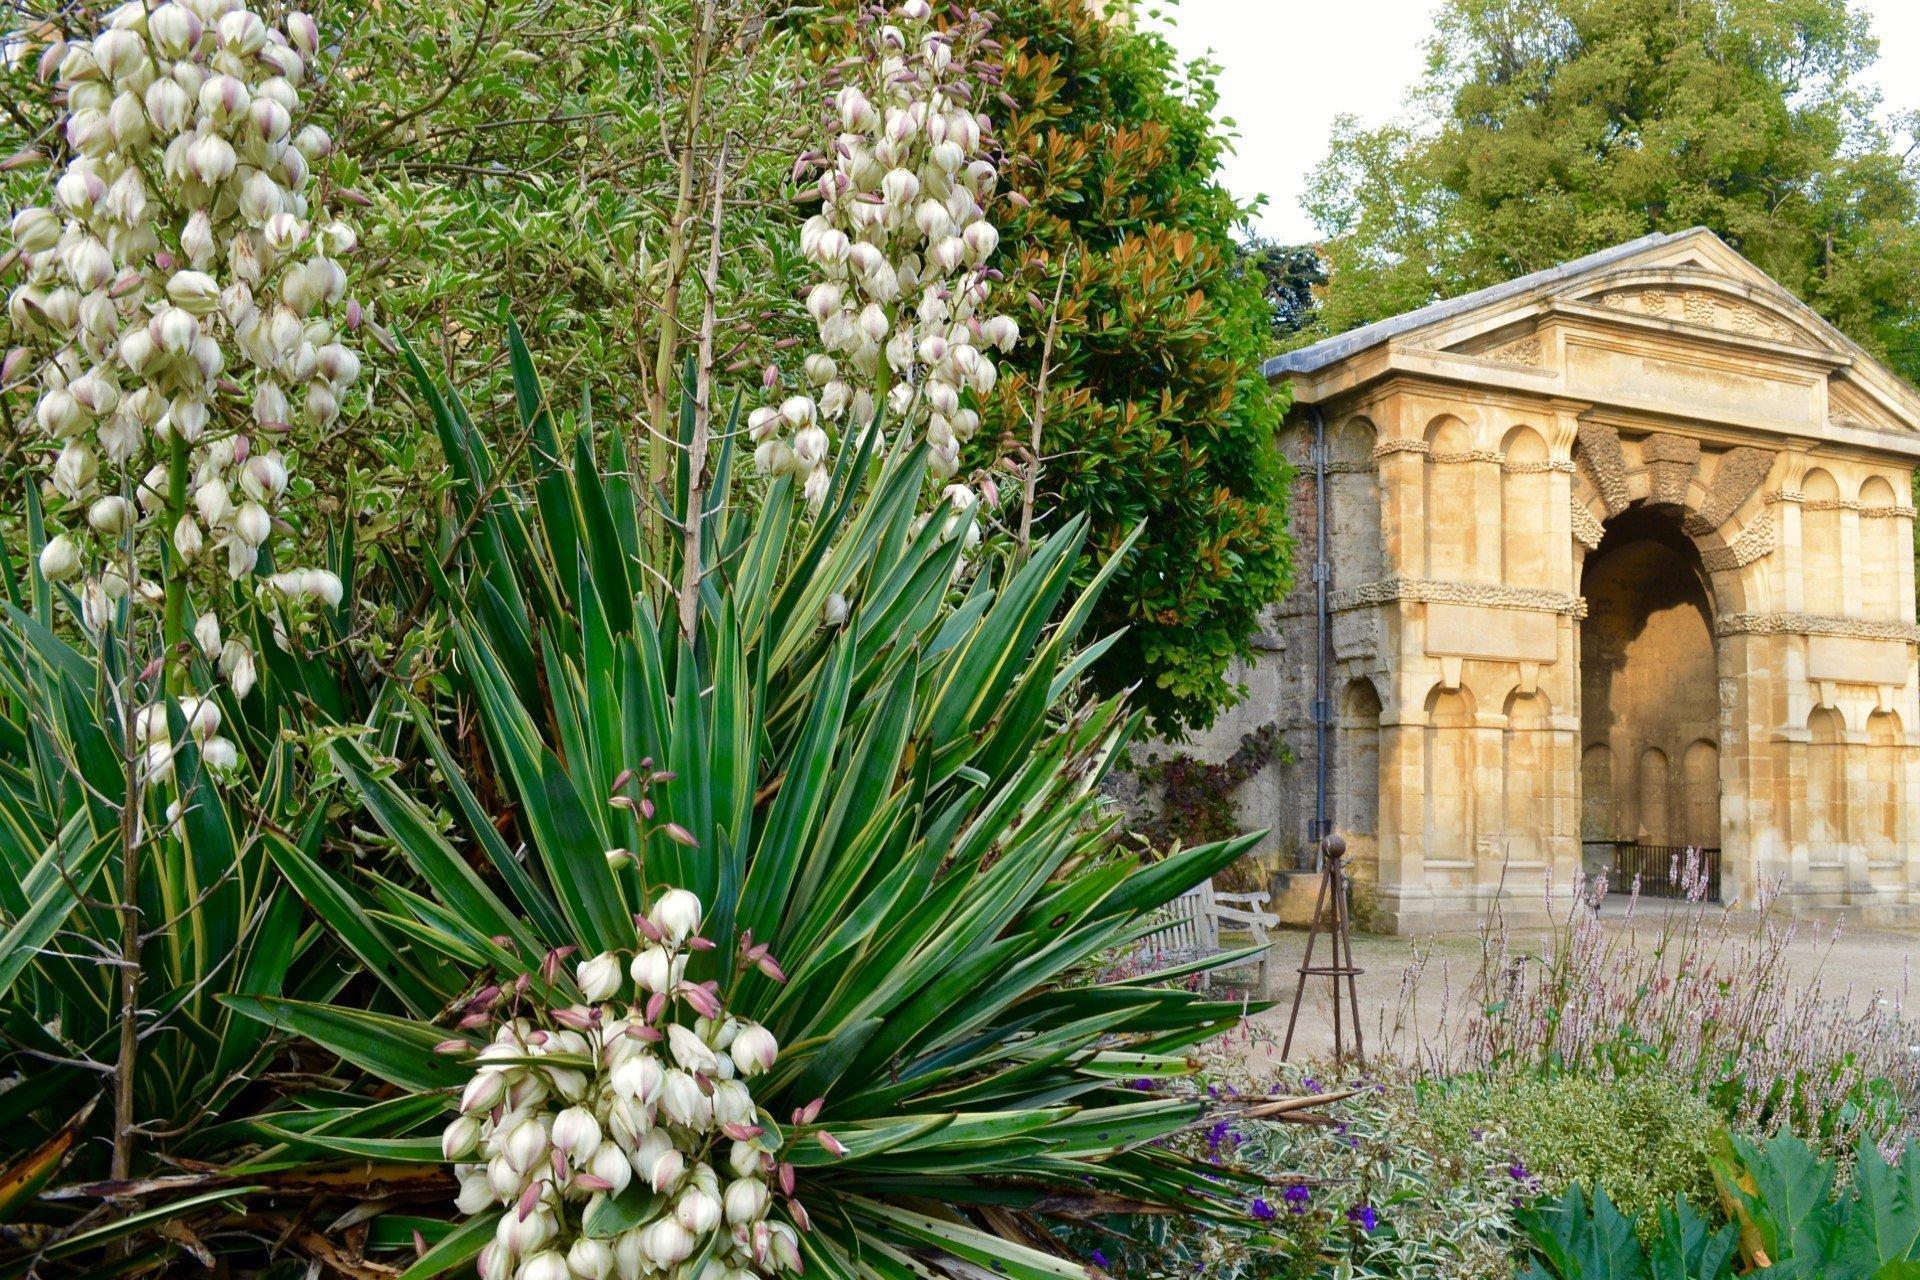 Oxford Botanic Garden - The Walled Garden